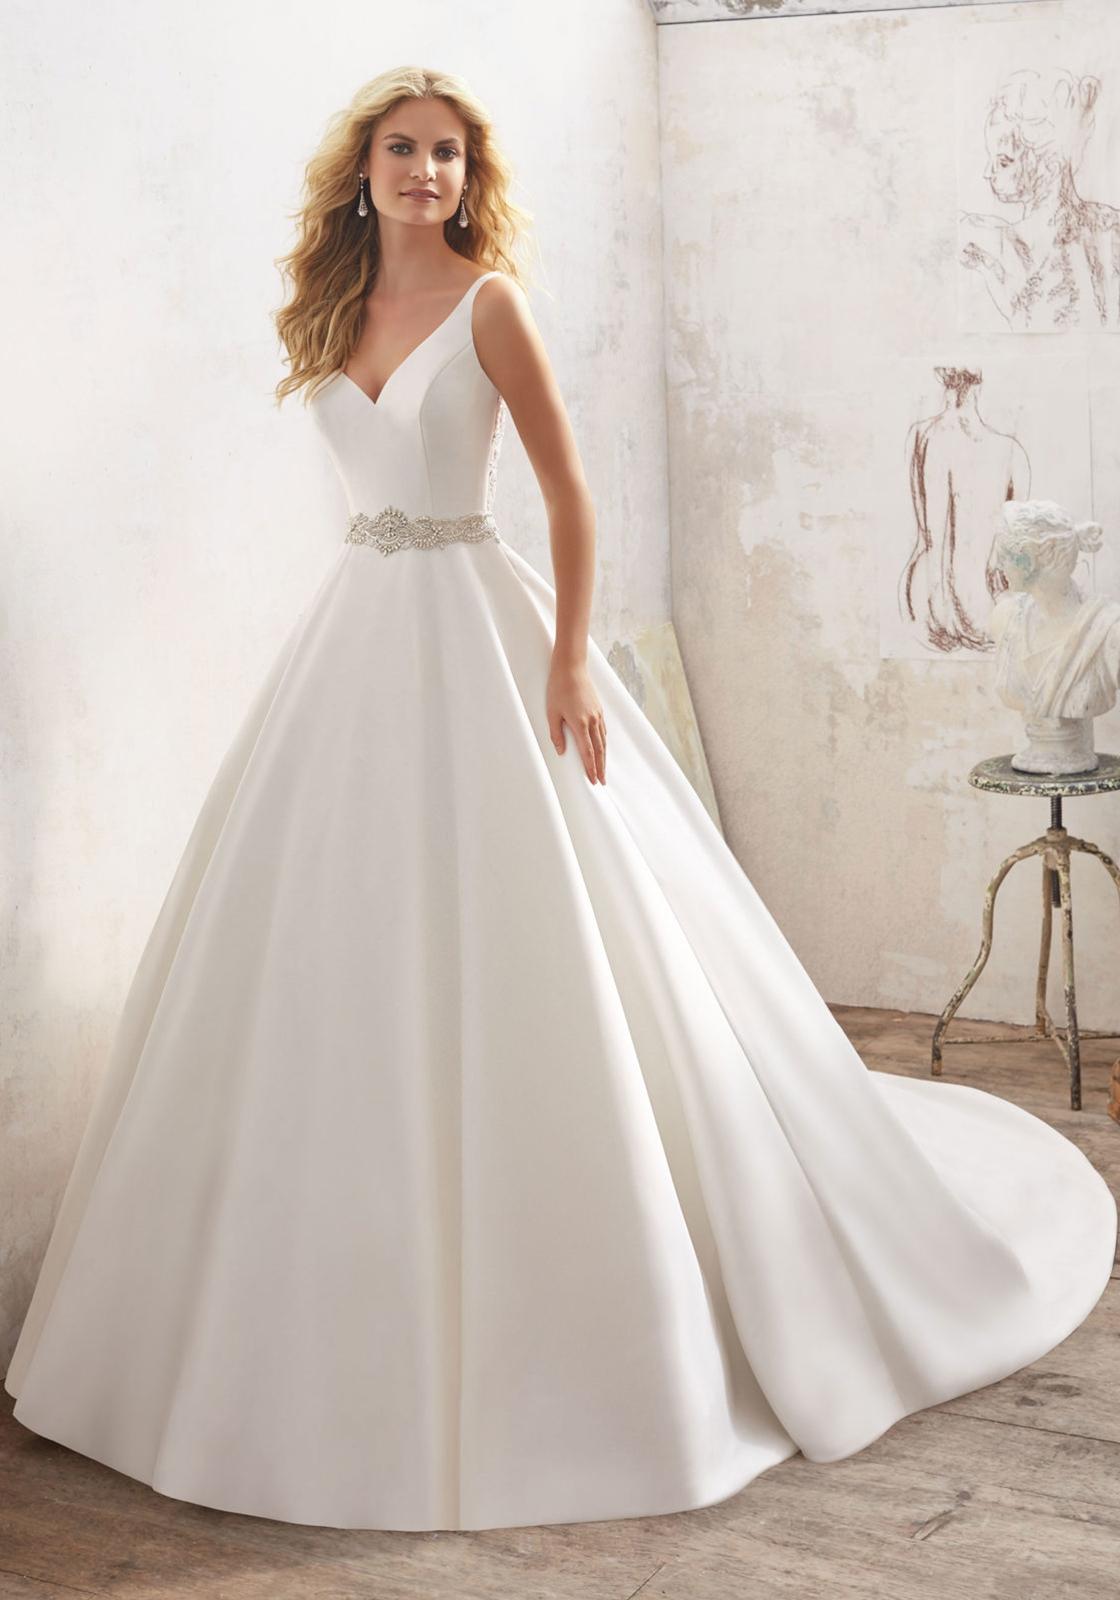 Mori Lee Wedding Dresses Wedding Dress Style 8123/Maribella ...